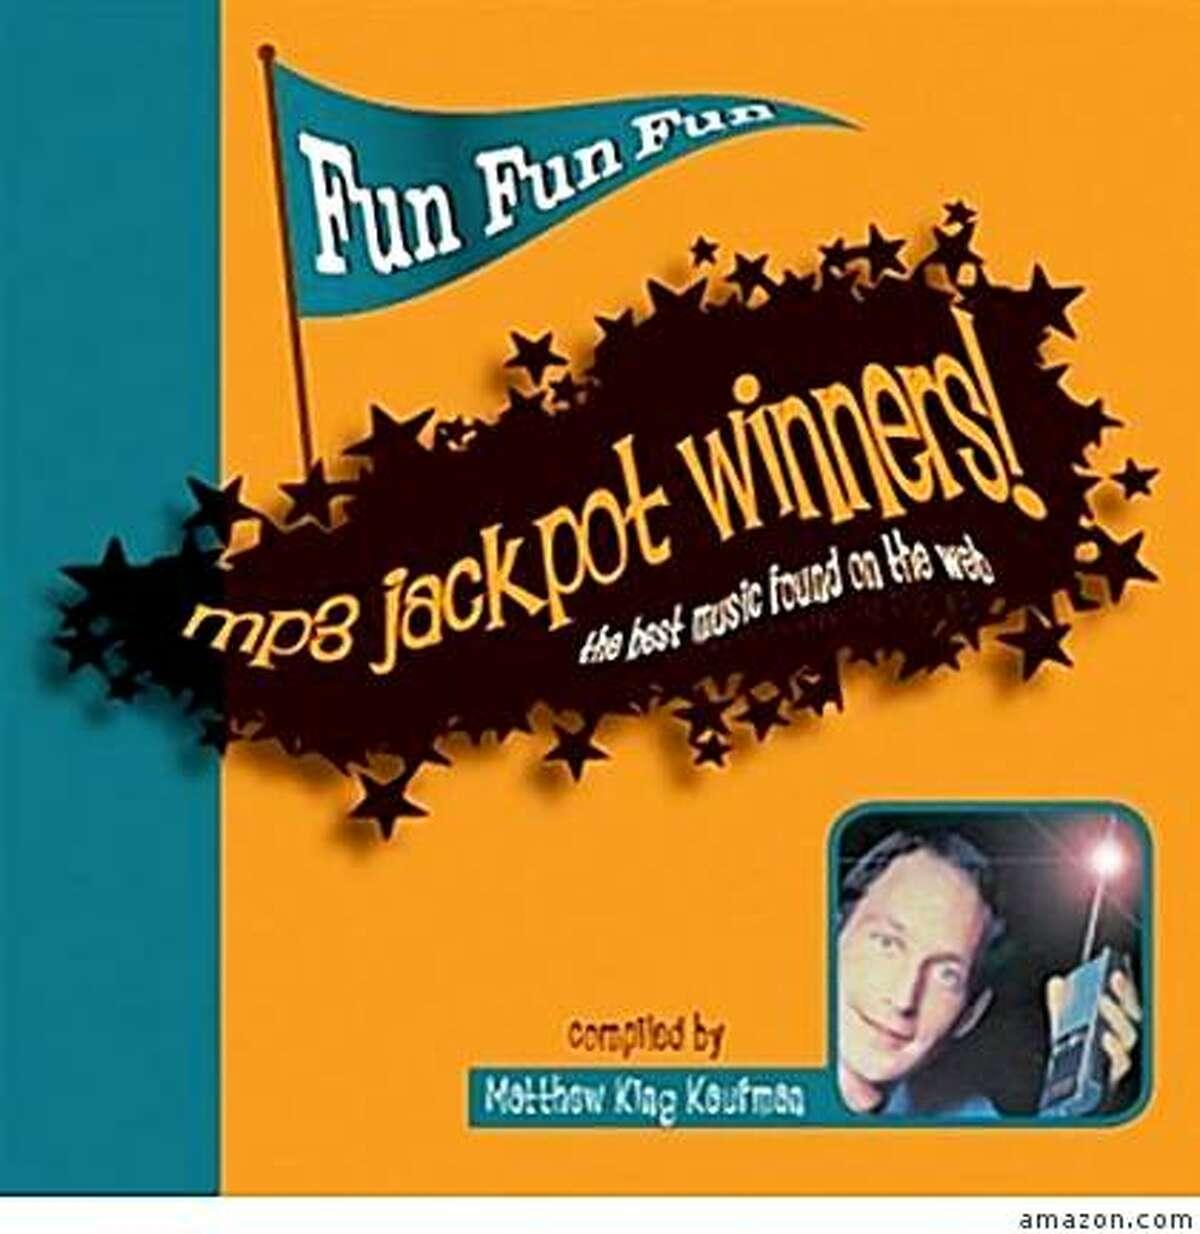 cd cover: MP3 JACKPOT WINNERS!